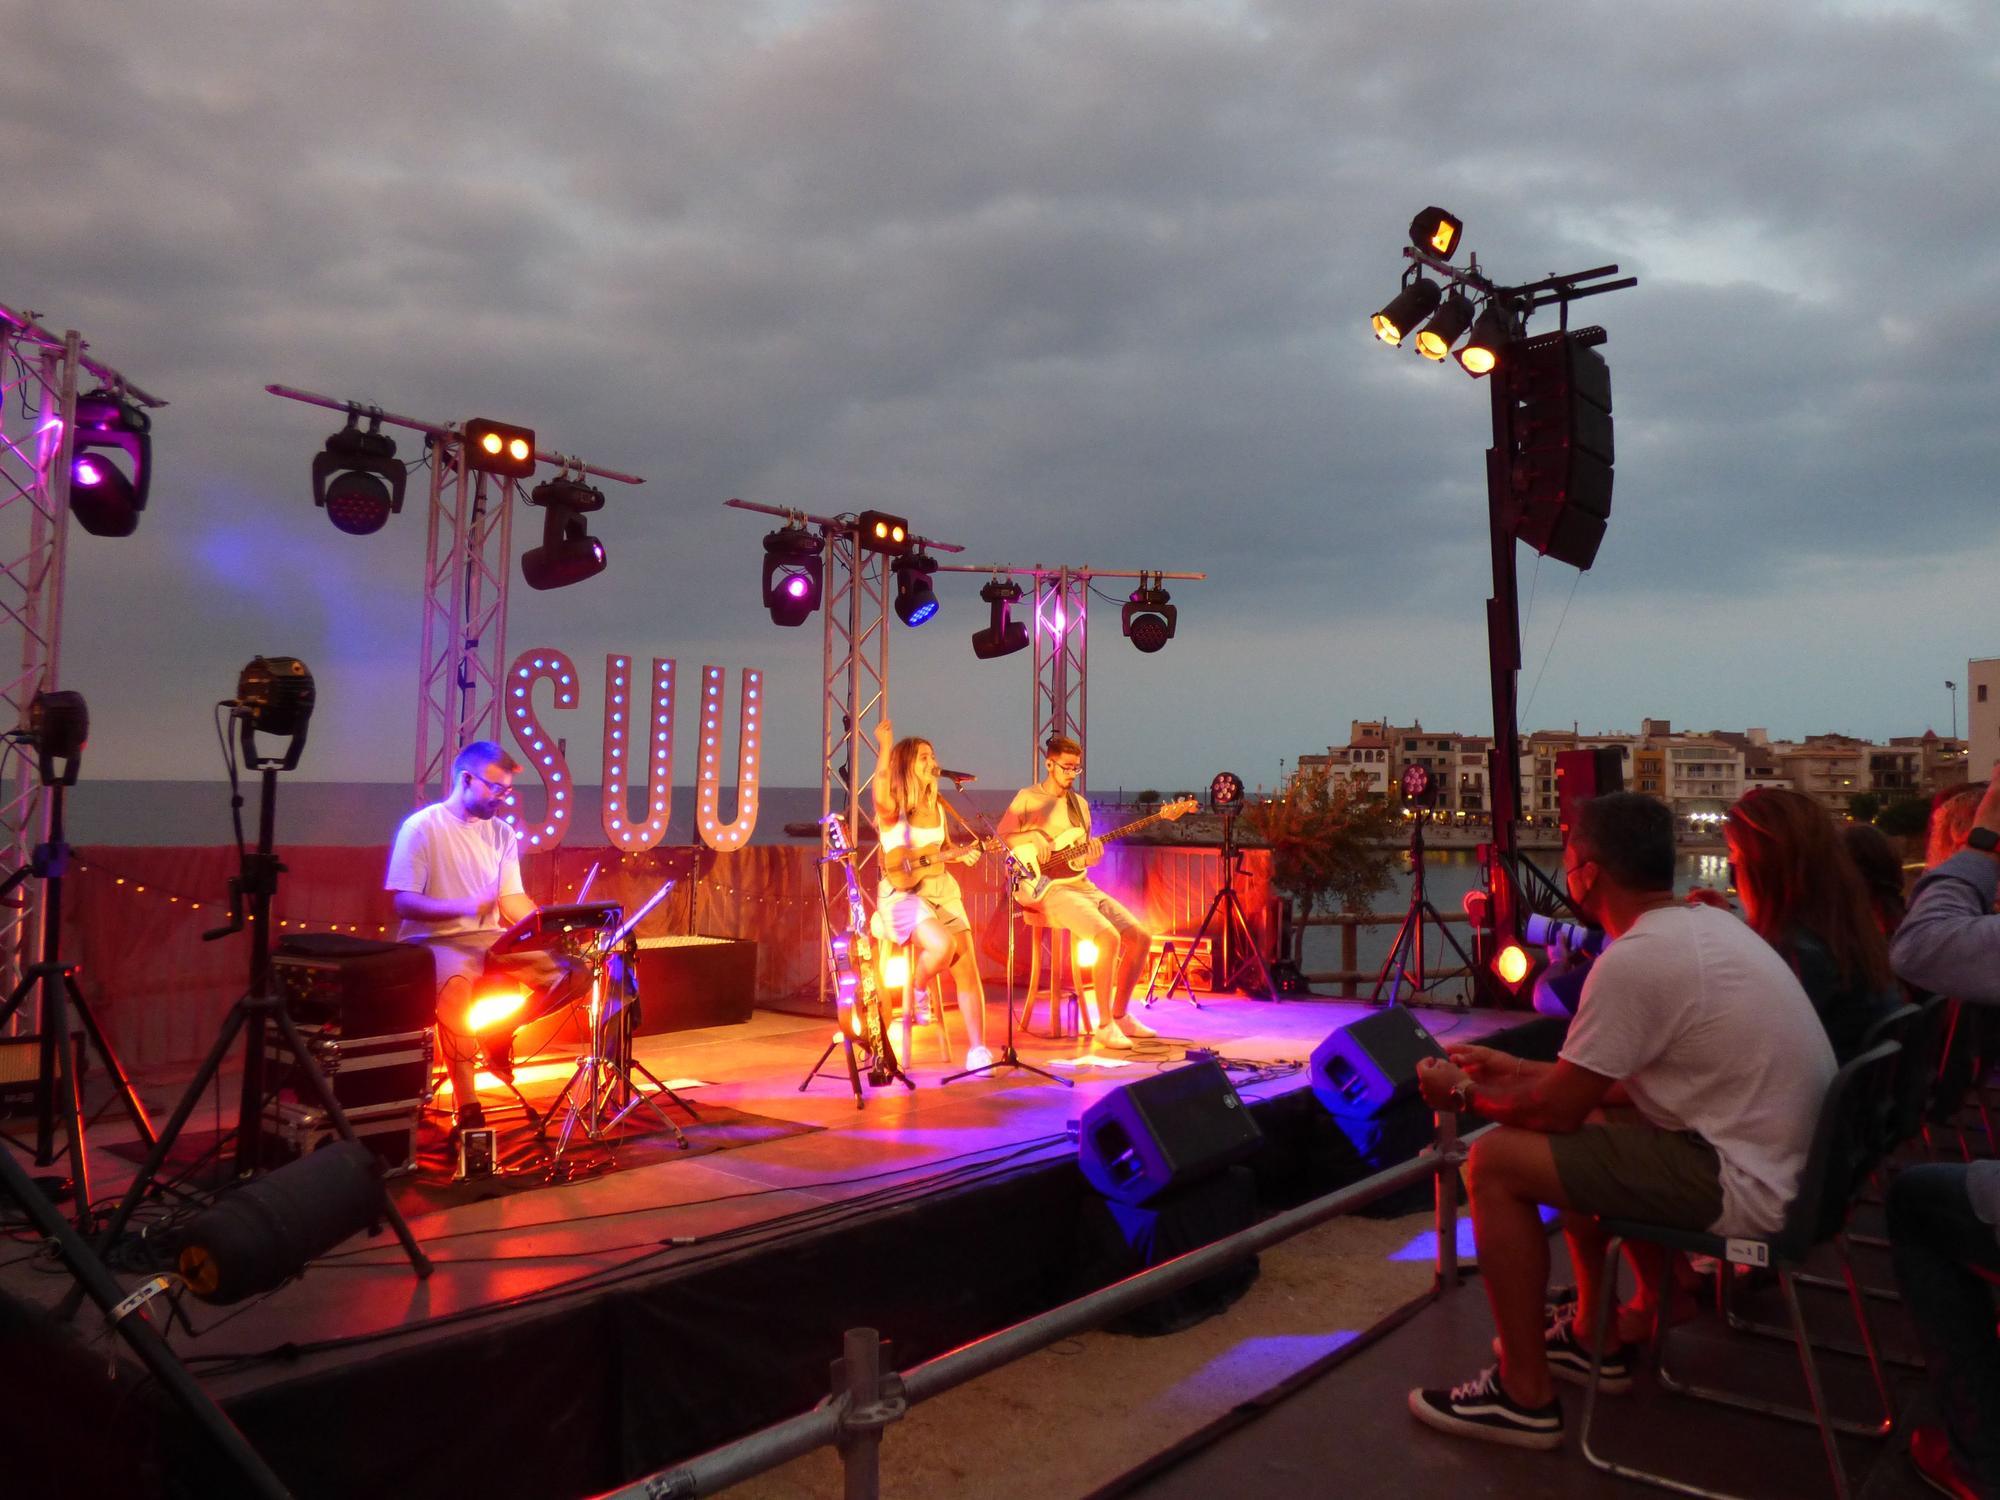 Suu actua al Festival Portalblau de l'Escala